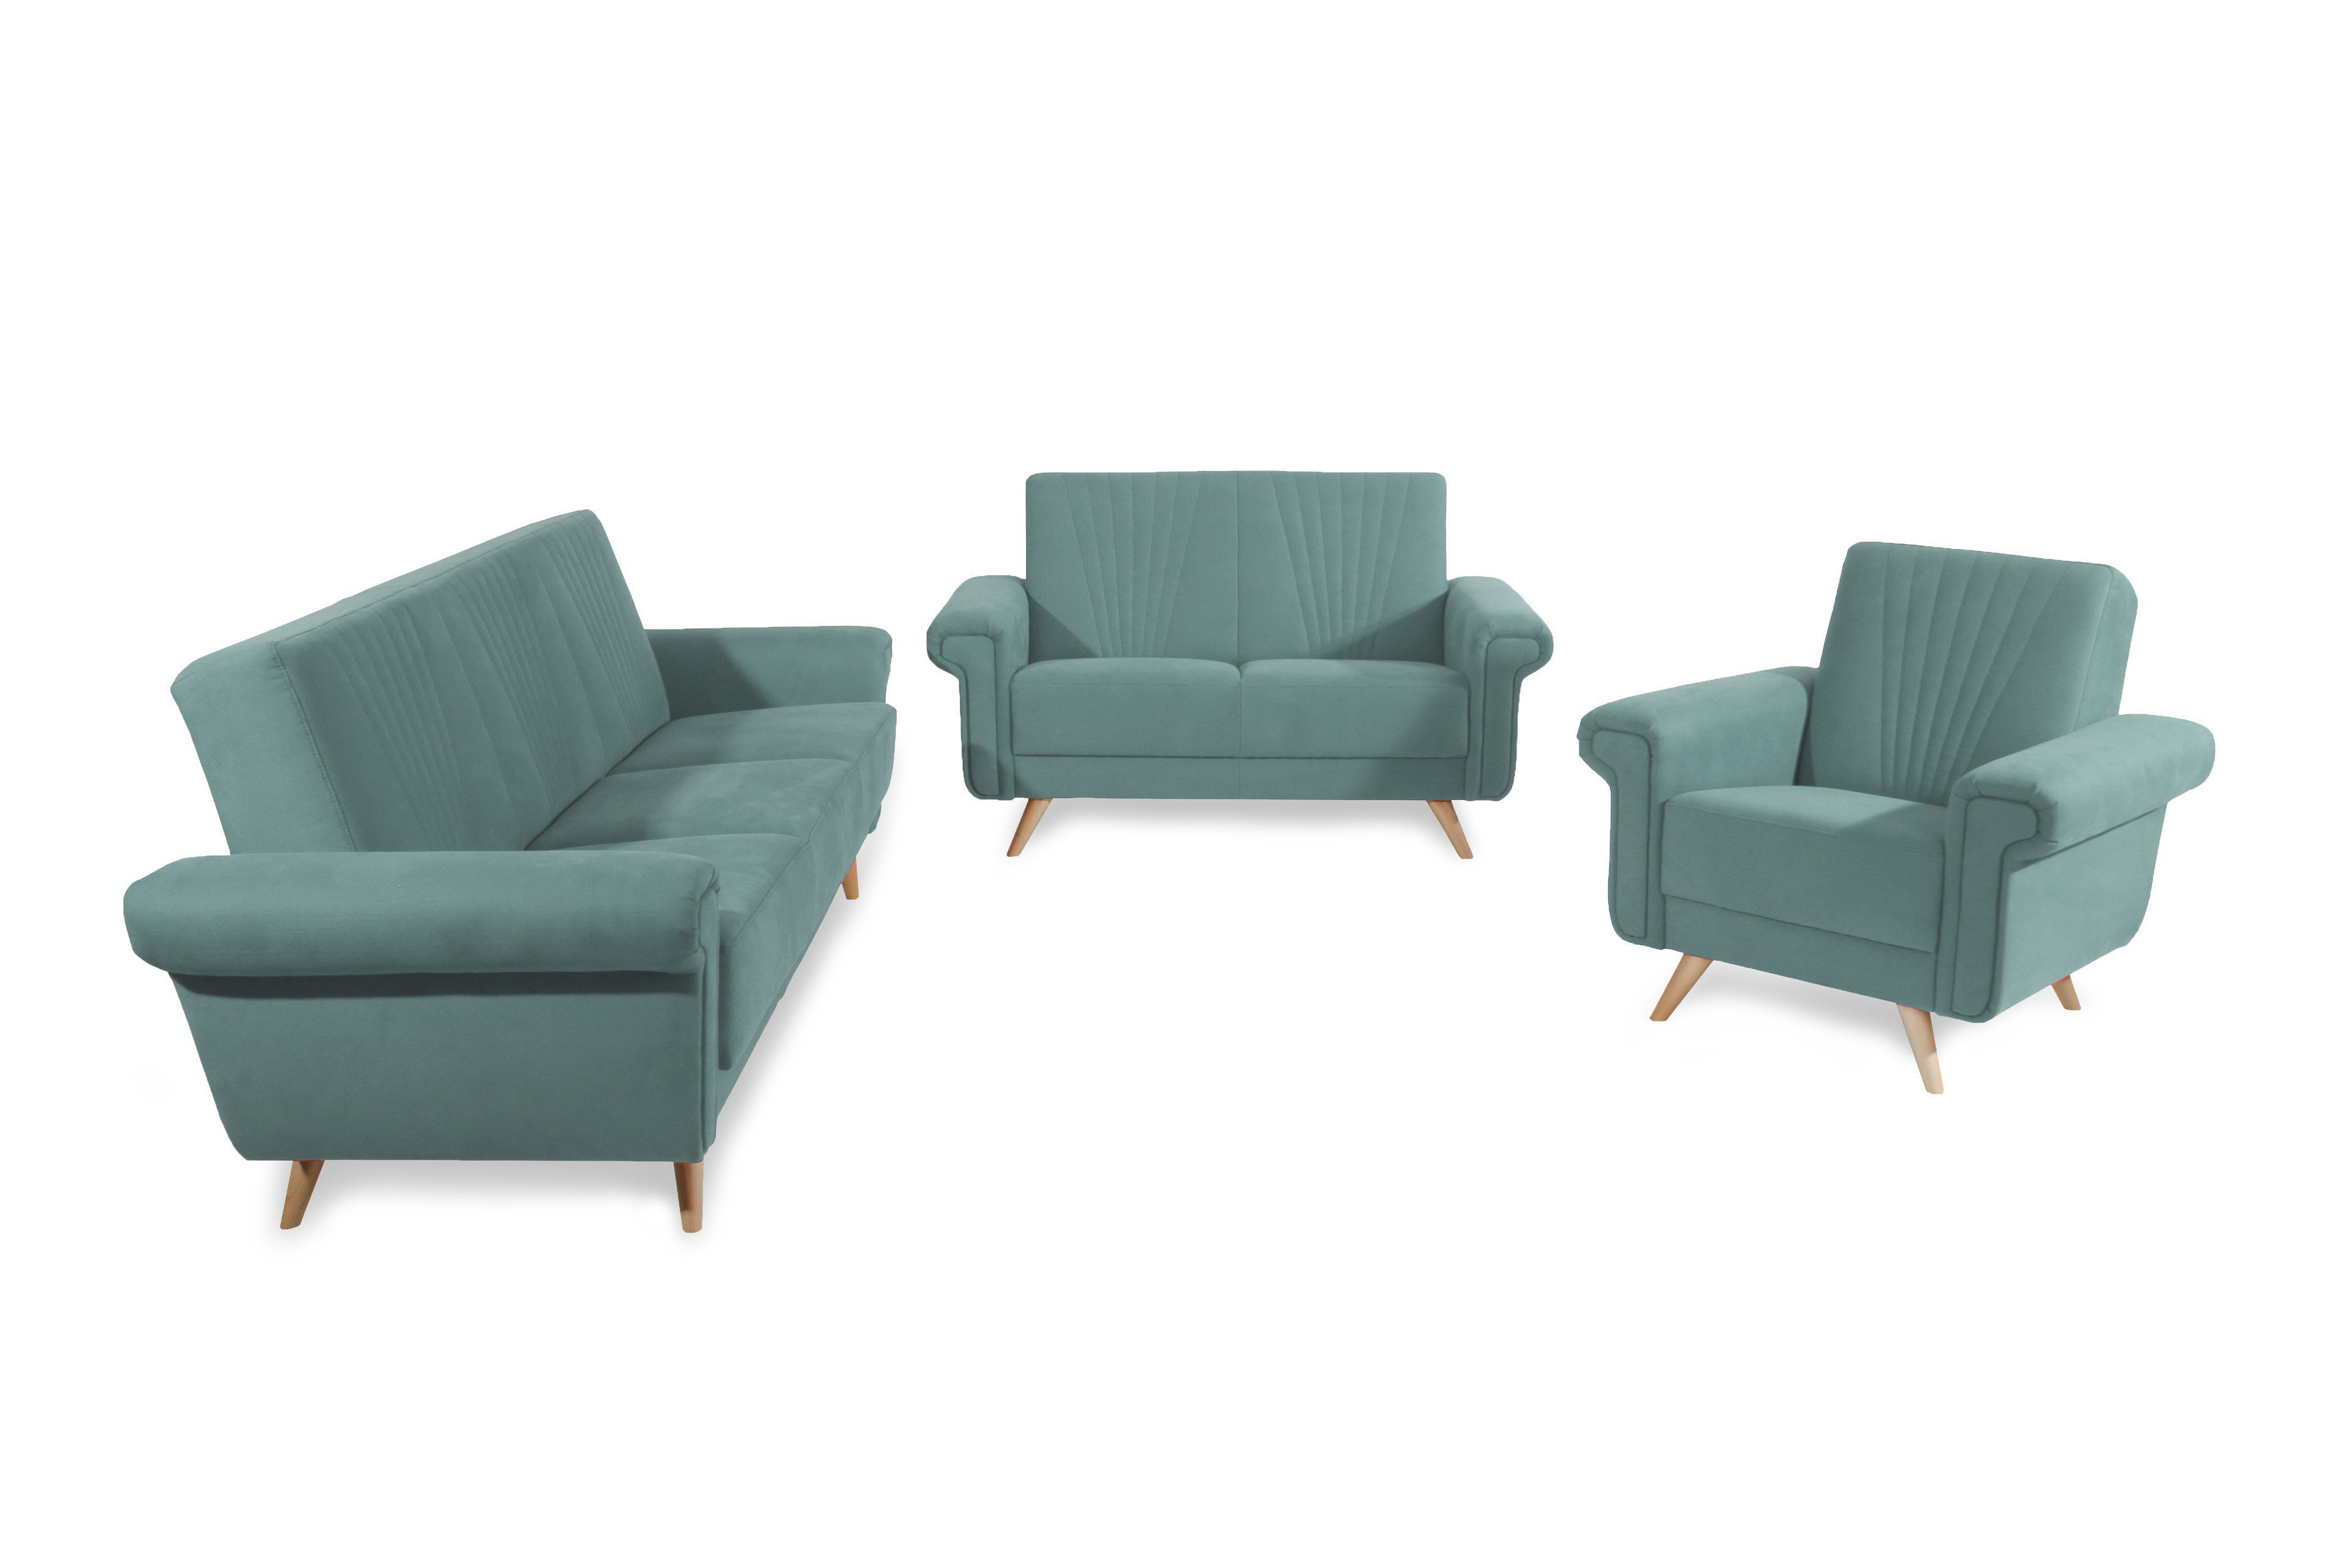 max winzer jannes garnitur aqua m bel letz ihr online shop. Black Bedroom Furniture Sets. Home Design Ideas